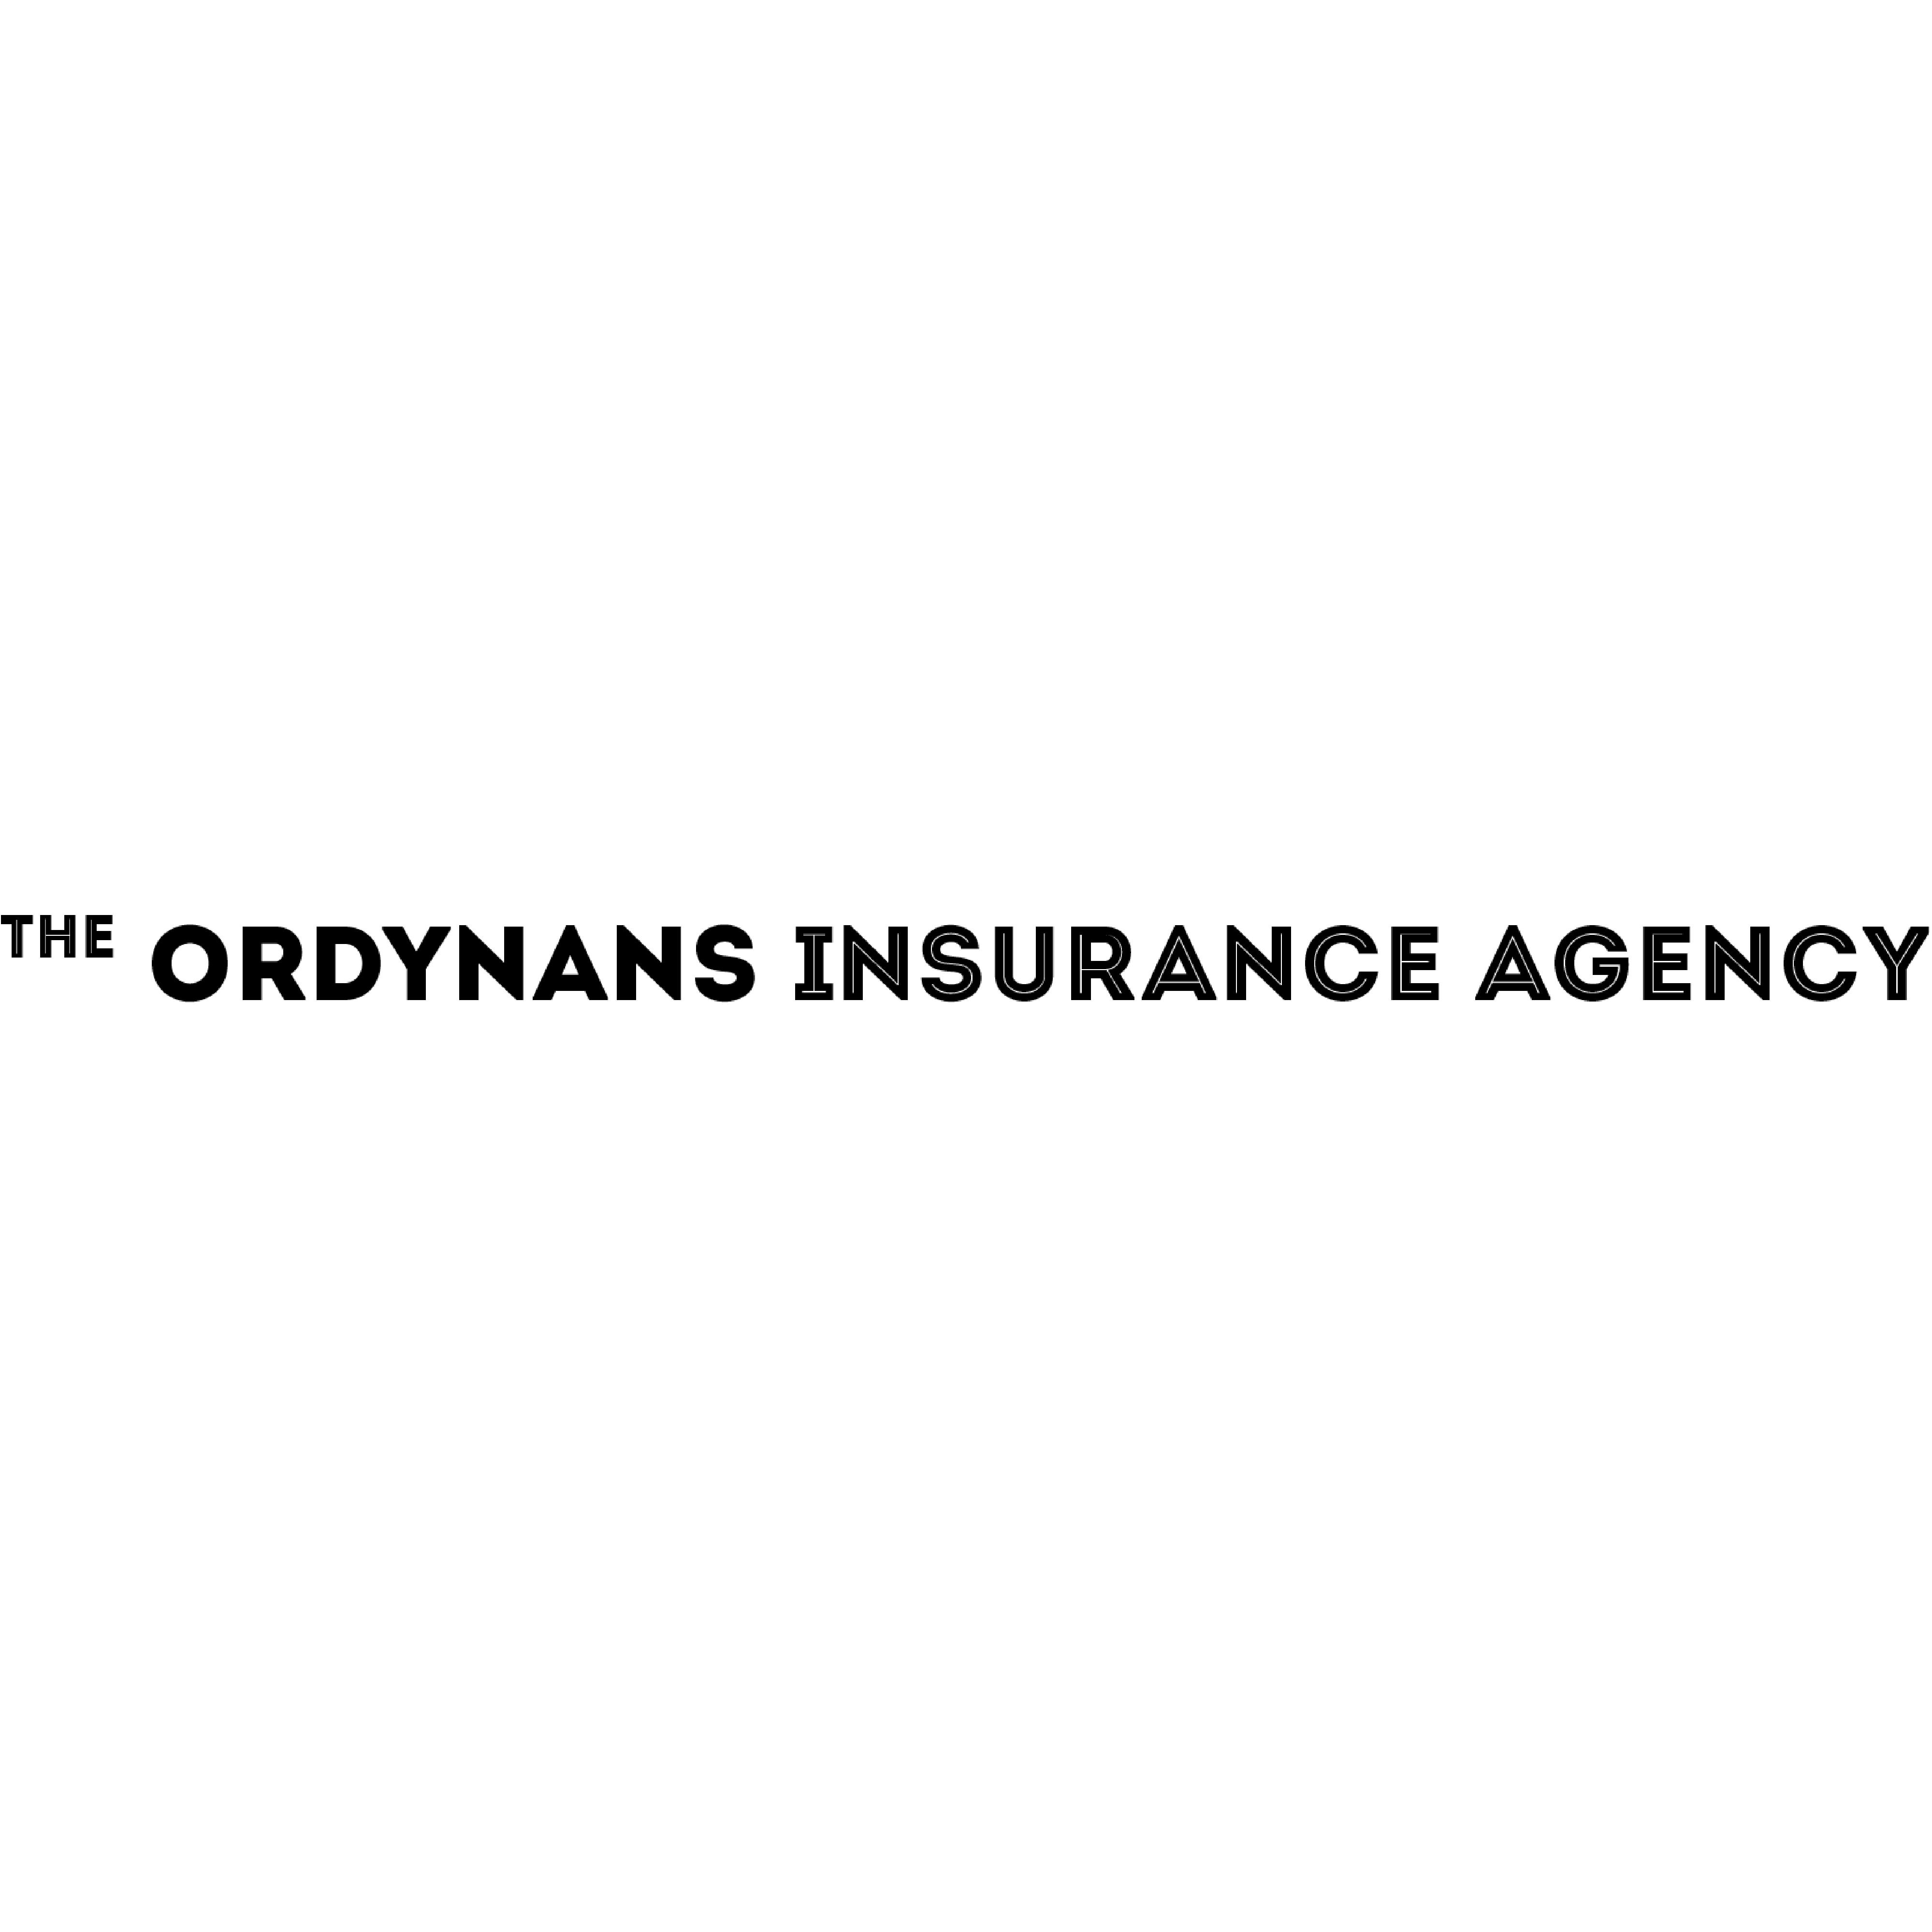 Ordynans Insurance Agency